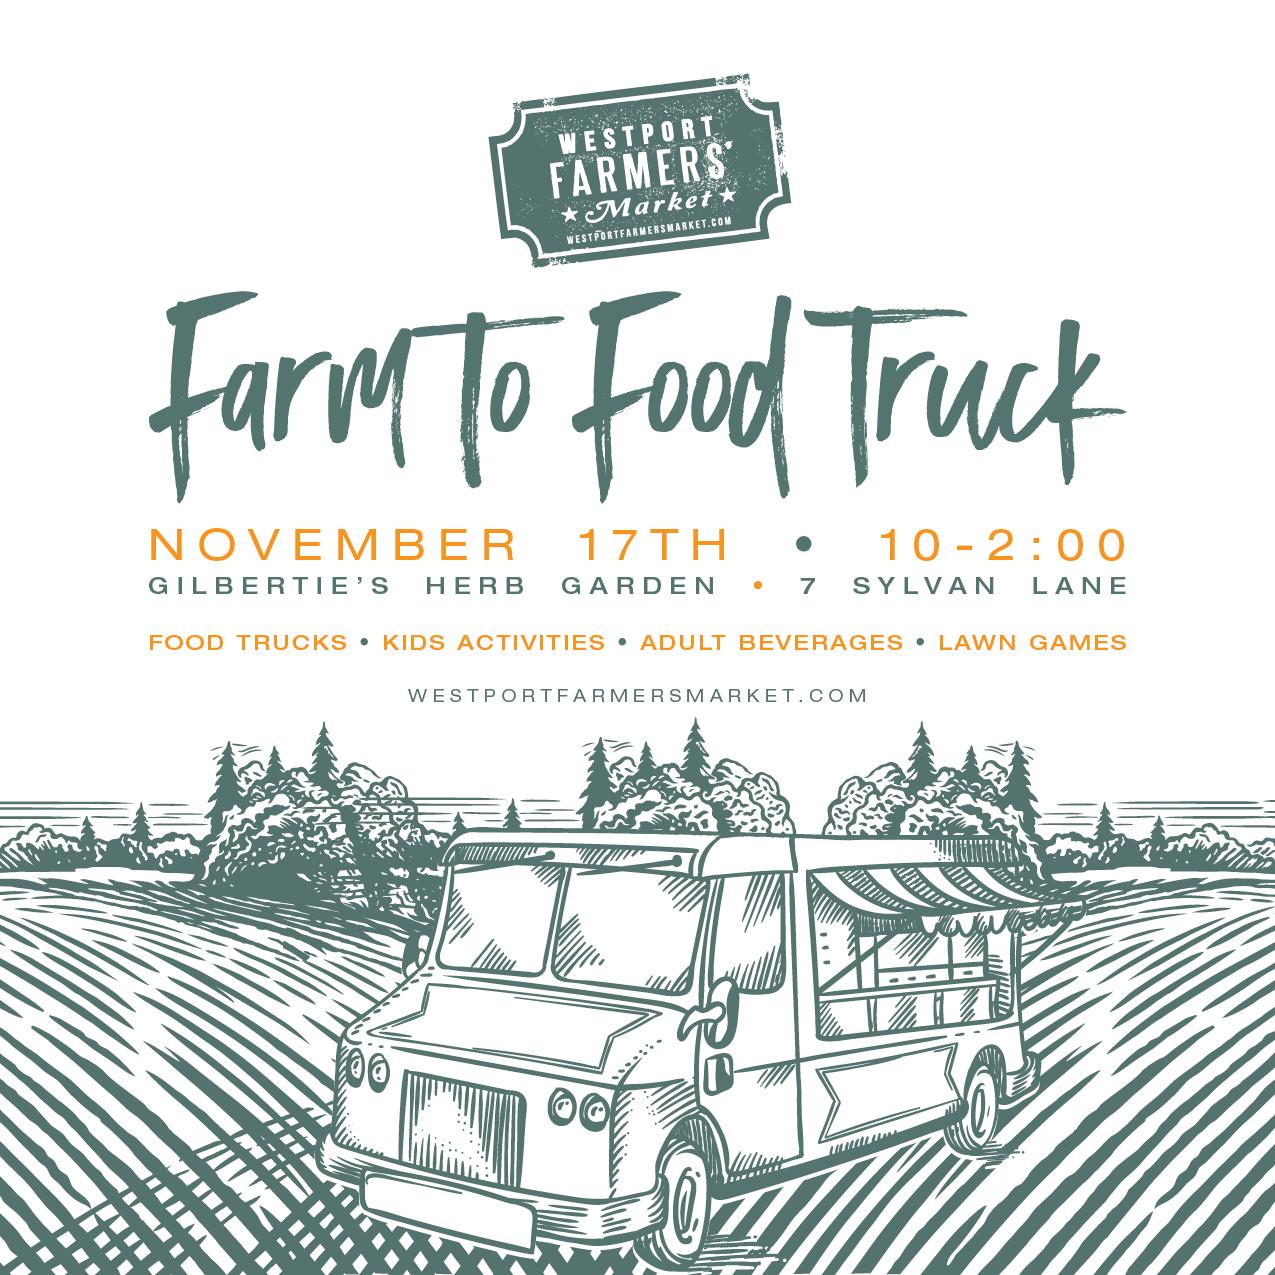 WFM_food_truck_winter19f.png